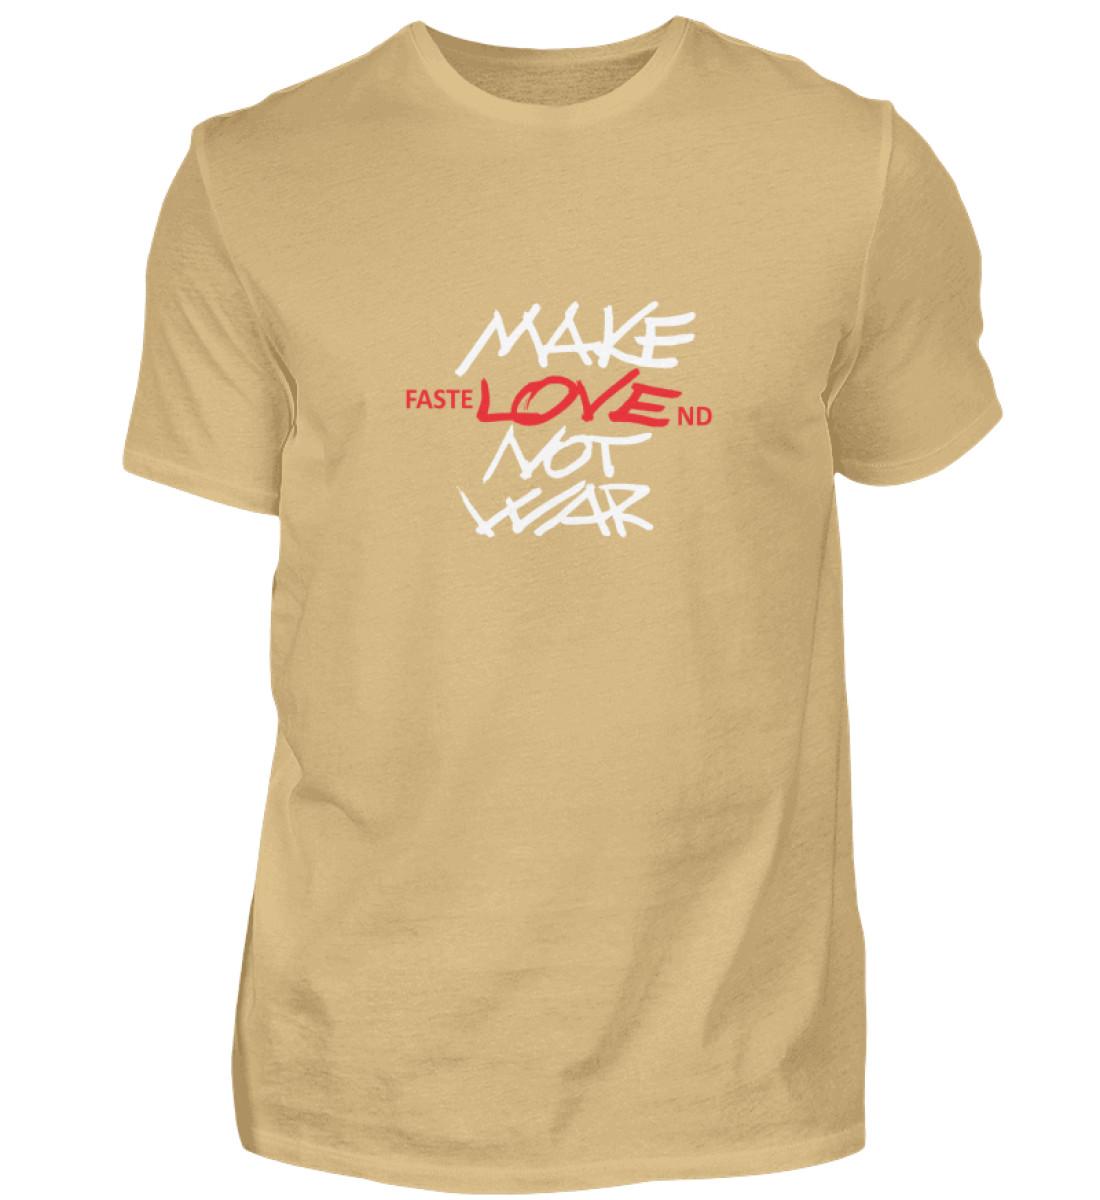 FasteLOVEnd Herren T-Shirt - Herren Shirt-224